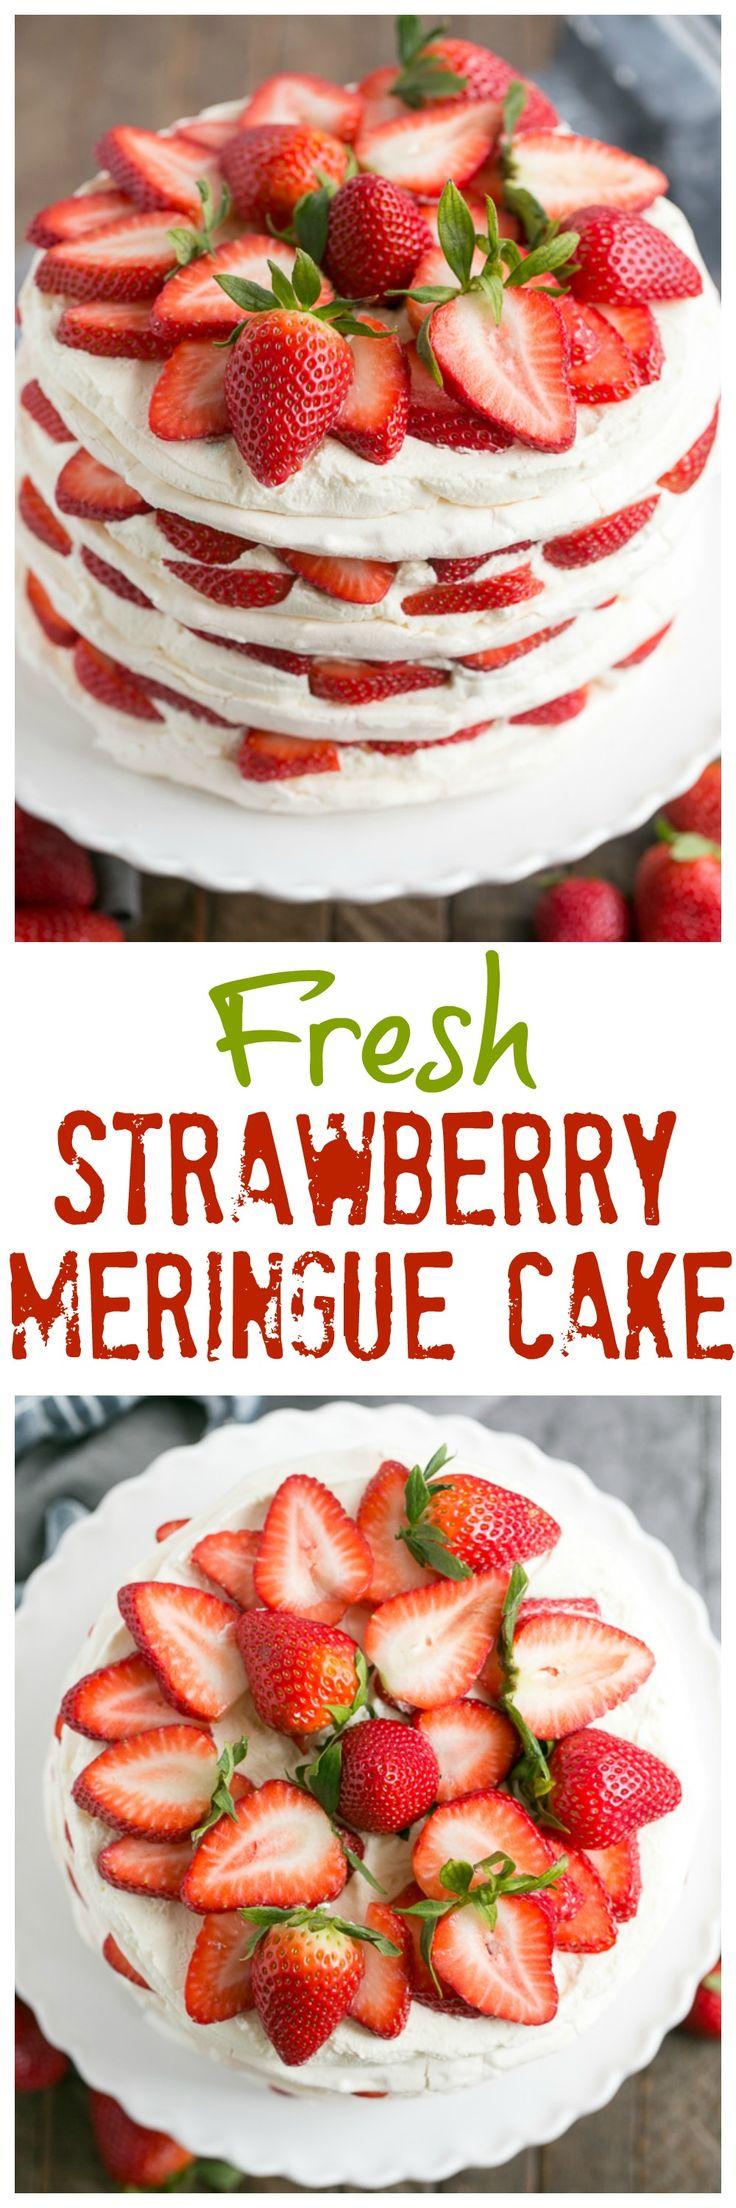 Fresh Strawberry Meringue Cake | A luscious dessert with layers of baked meringue, fresh strawberries and mascarpone whipped cream! #SundaySupper